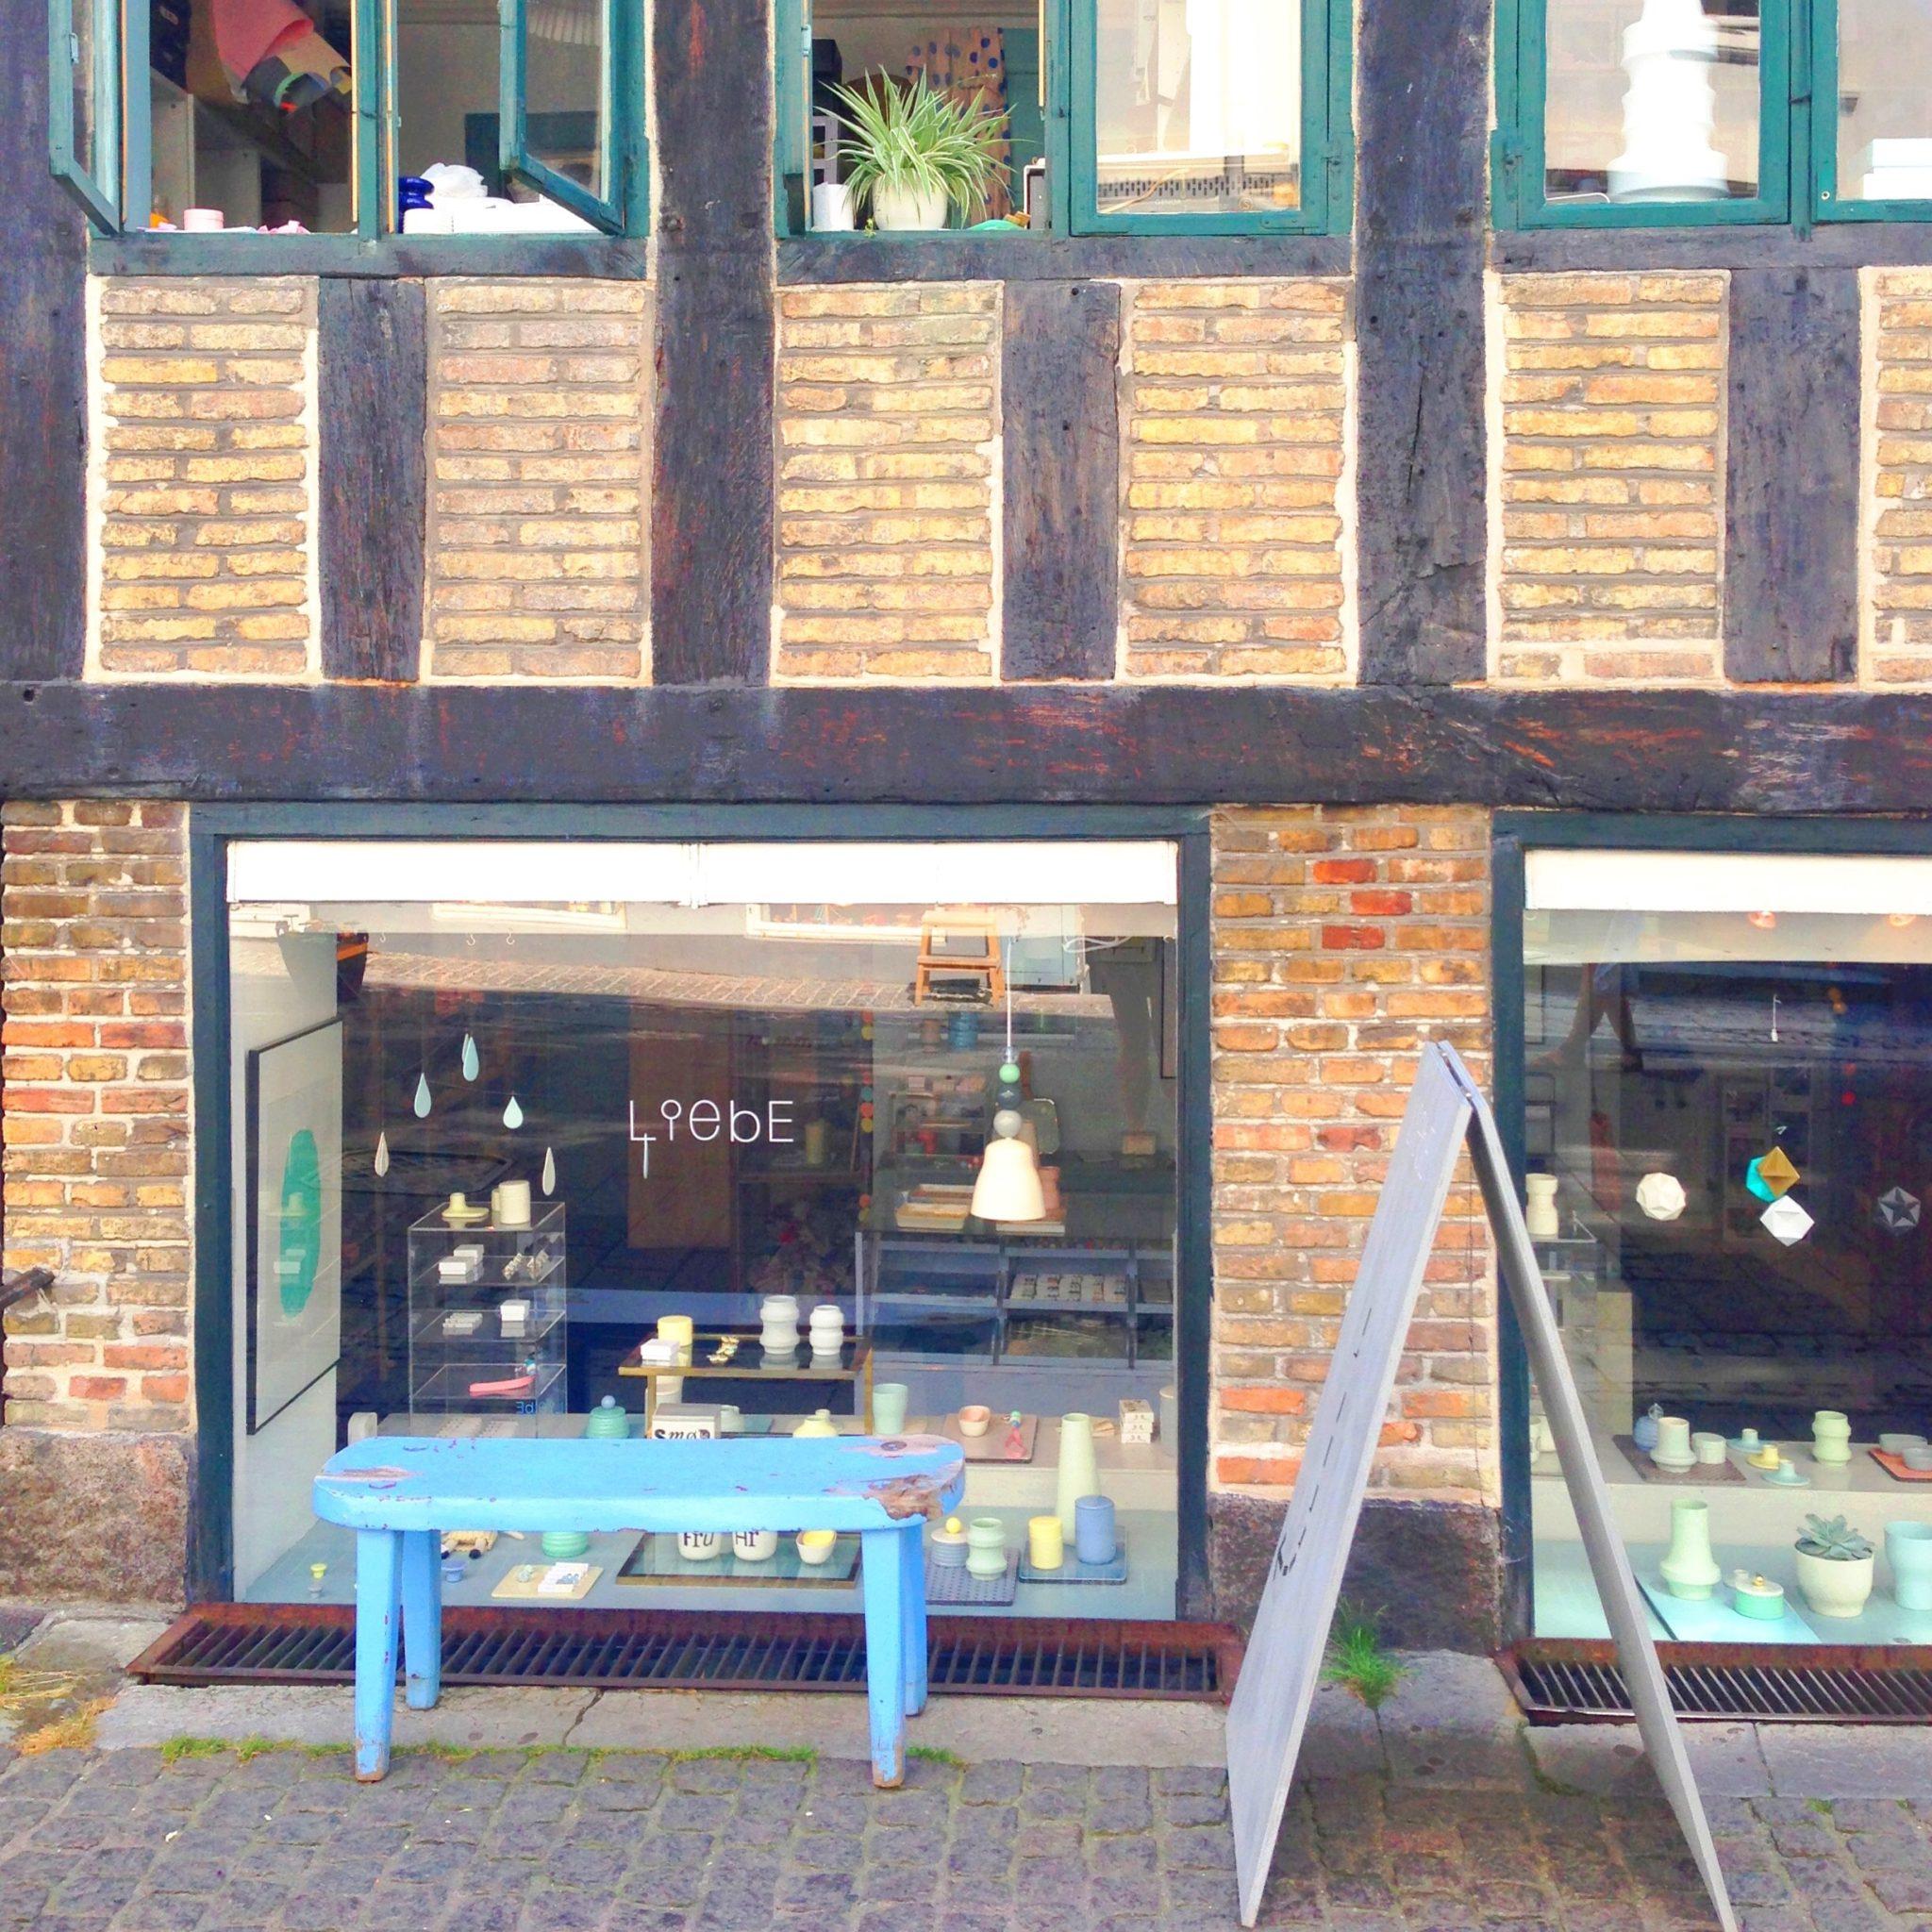 Liebe Copenhagen. Porcelæn og dansk design keramik. Flot facade.